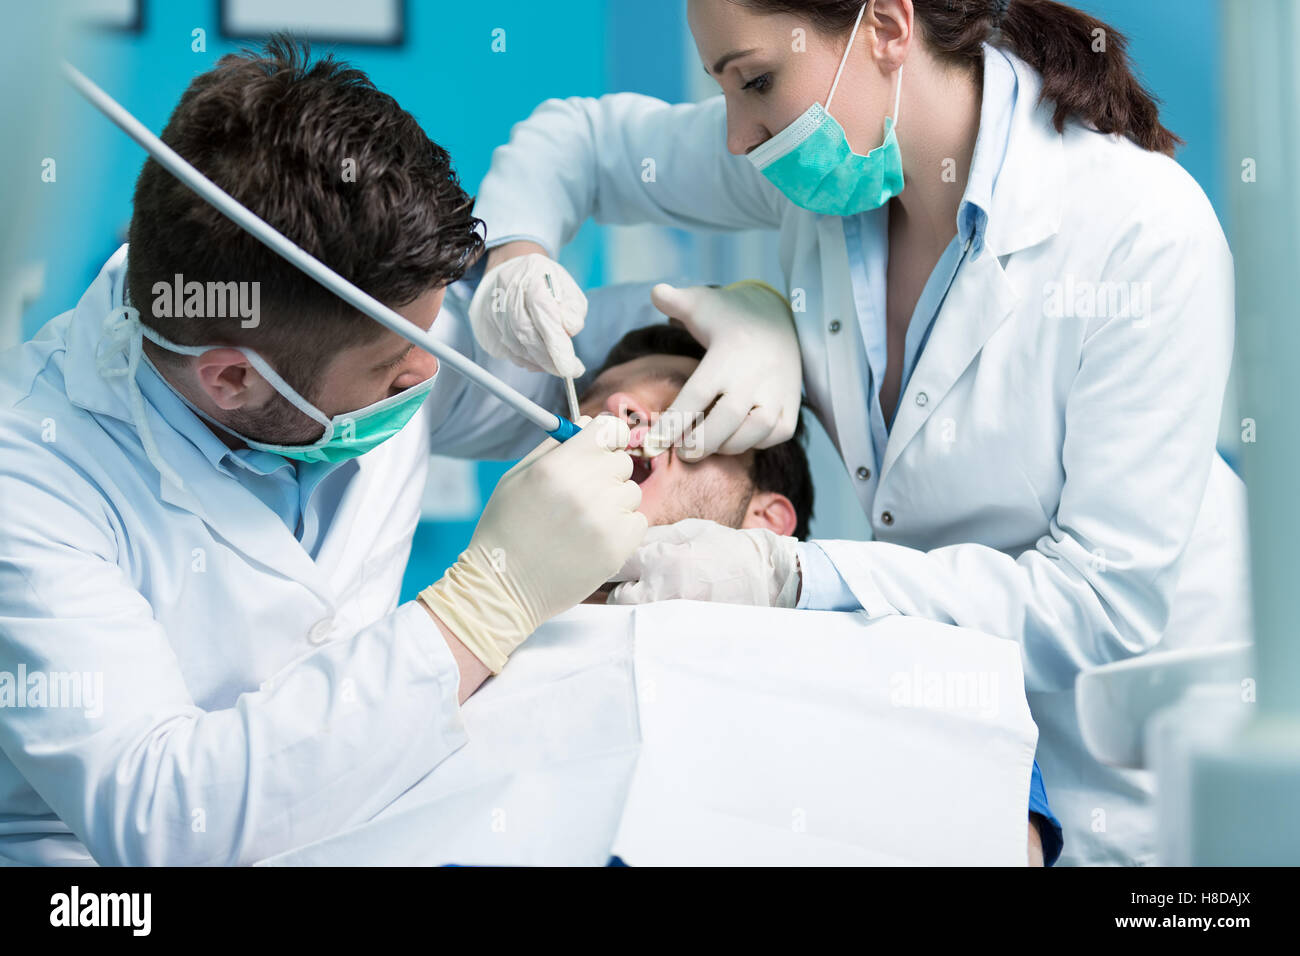 Dentistry education. Male dentist doctor teacher explaining treatment procedure. - Stock Image